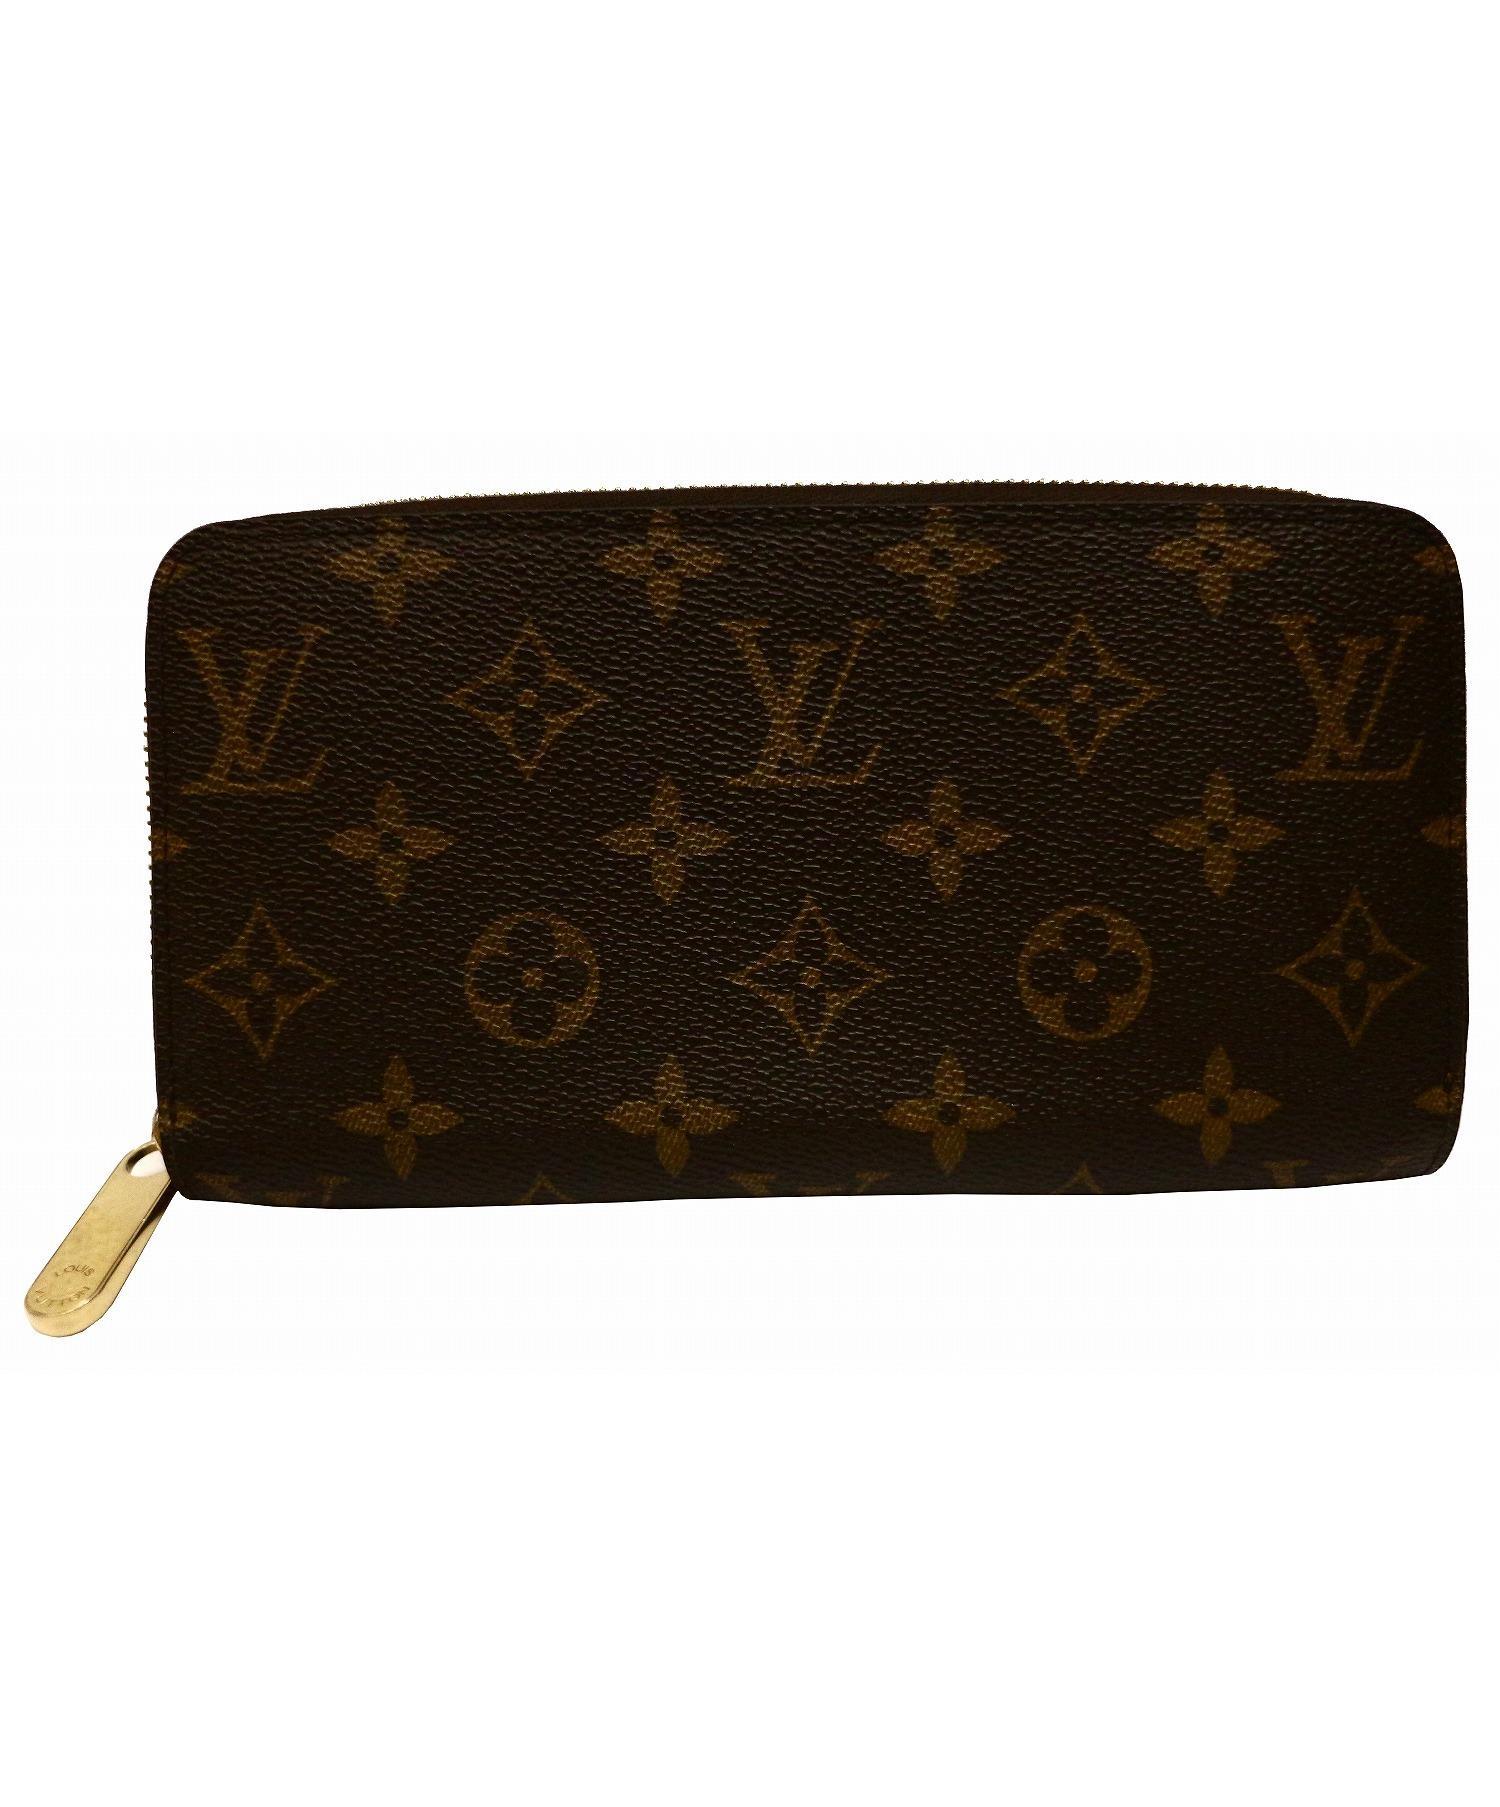 online store e5446 fbf6f [中古]LOUIS VUITTON(ルイヴィトン)のレディース 服飾小物 ジッピーウォレット 財布